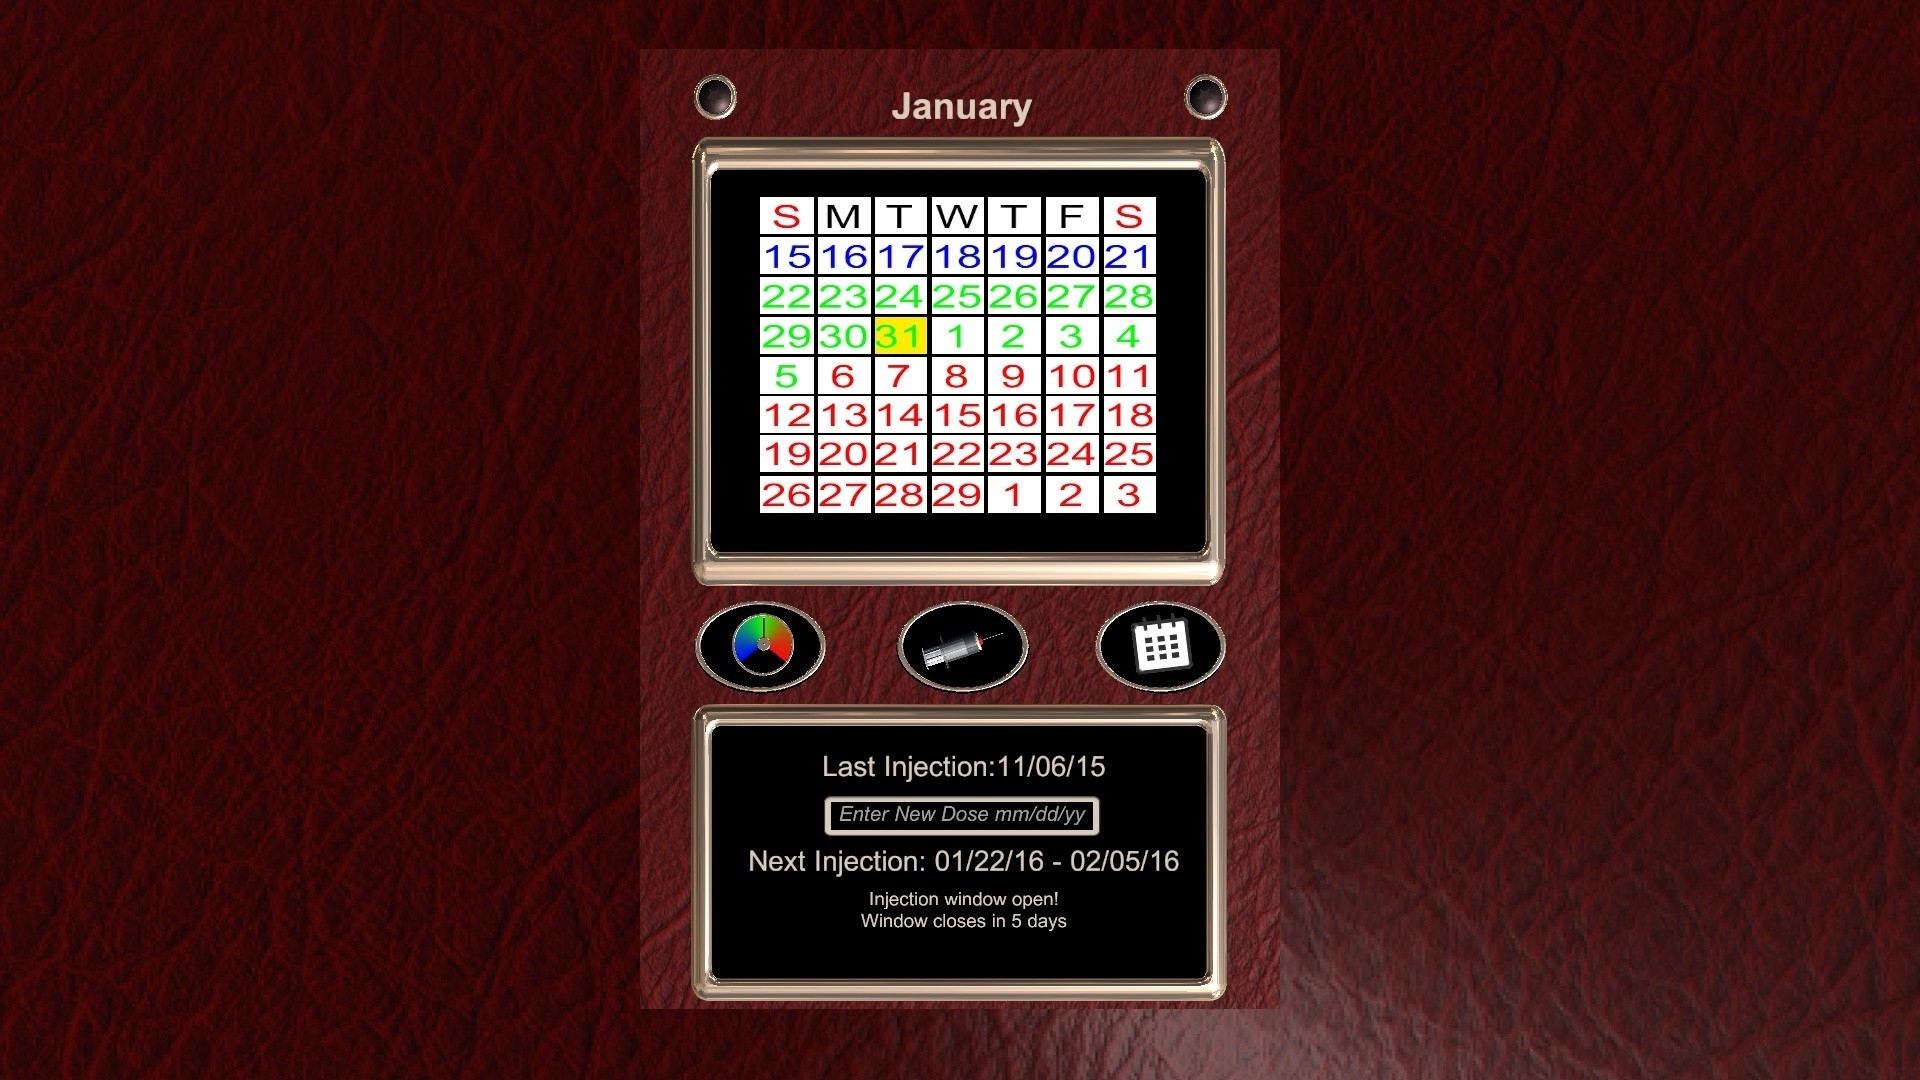 D-Calendar - Unity Connect  Medroxy Progesterone 2021 Calendar